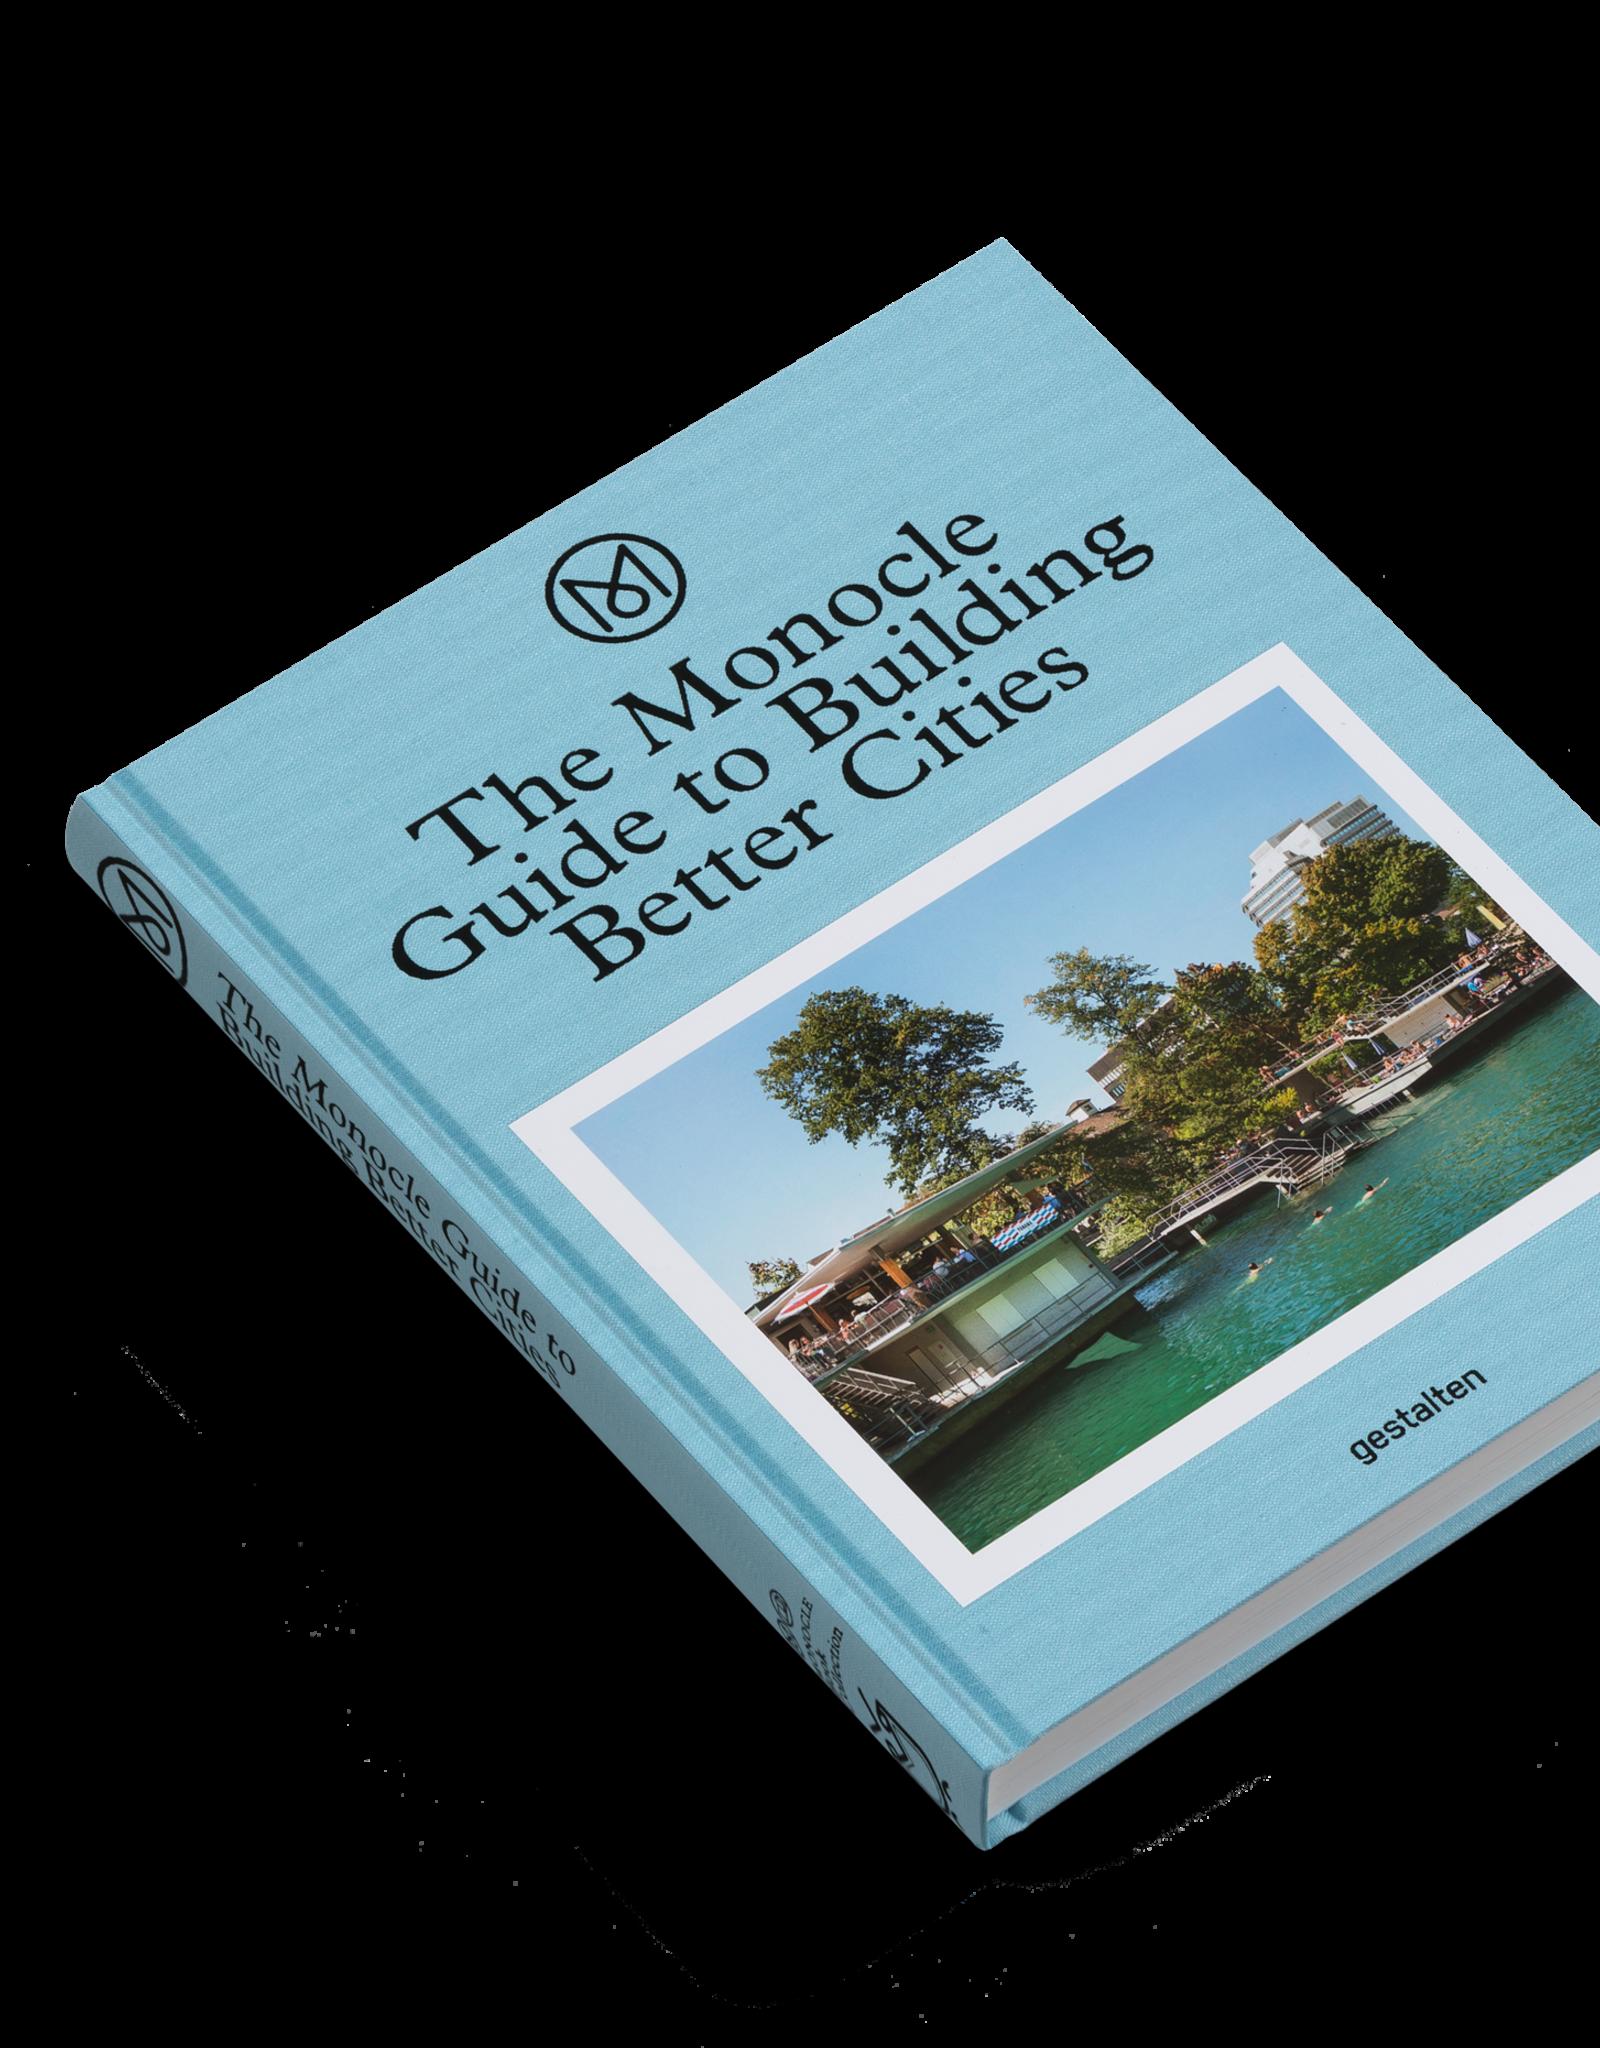 Gestalten Monocle Guide to Building Better Cities